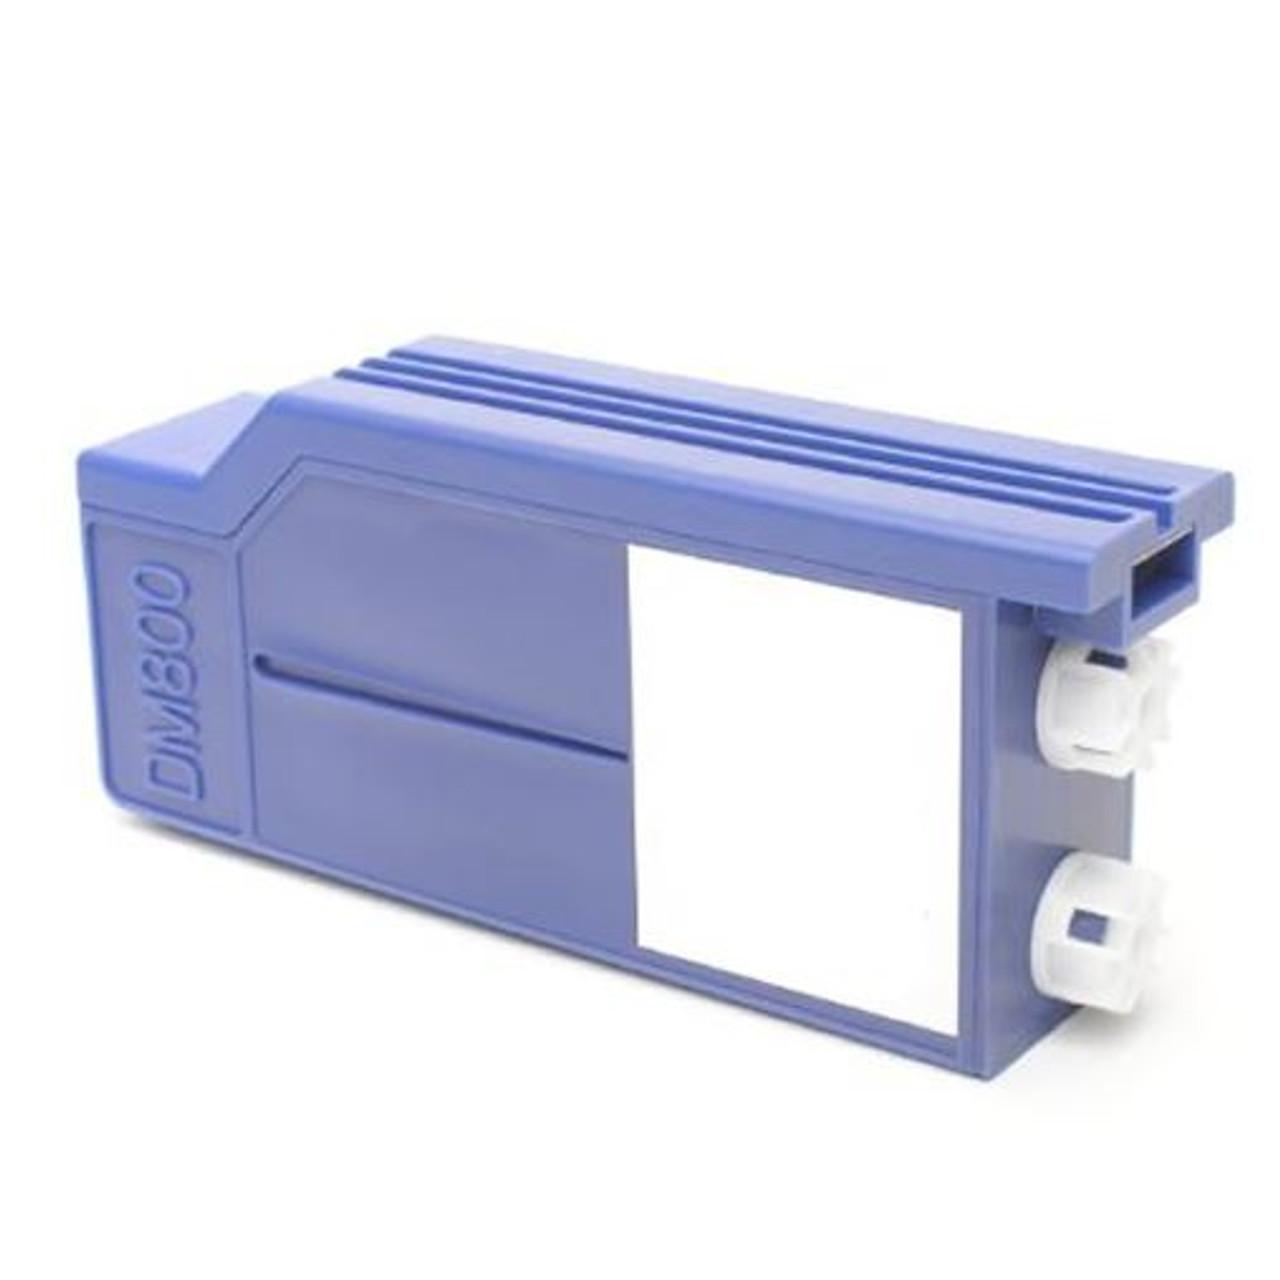 Compatible Pitney Bowes DM800 - DM1000 Franking Ink Cartridge